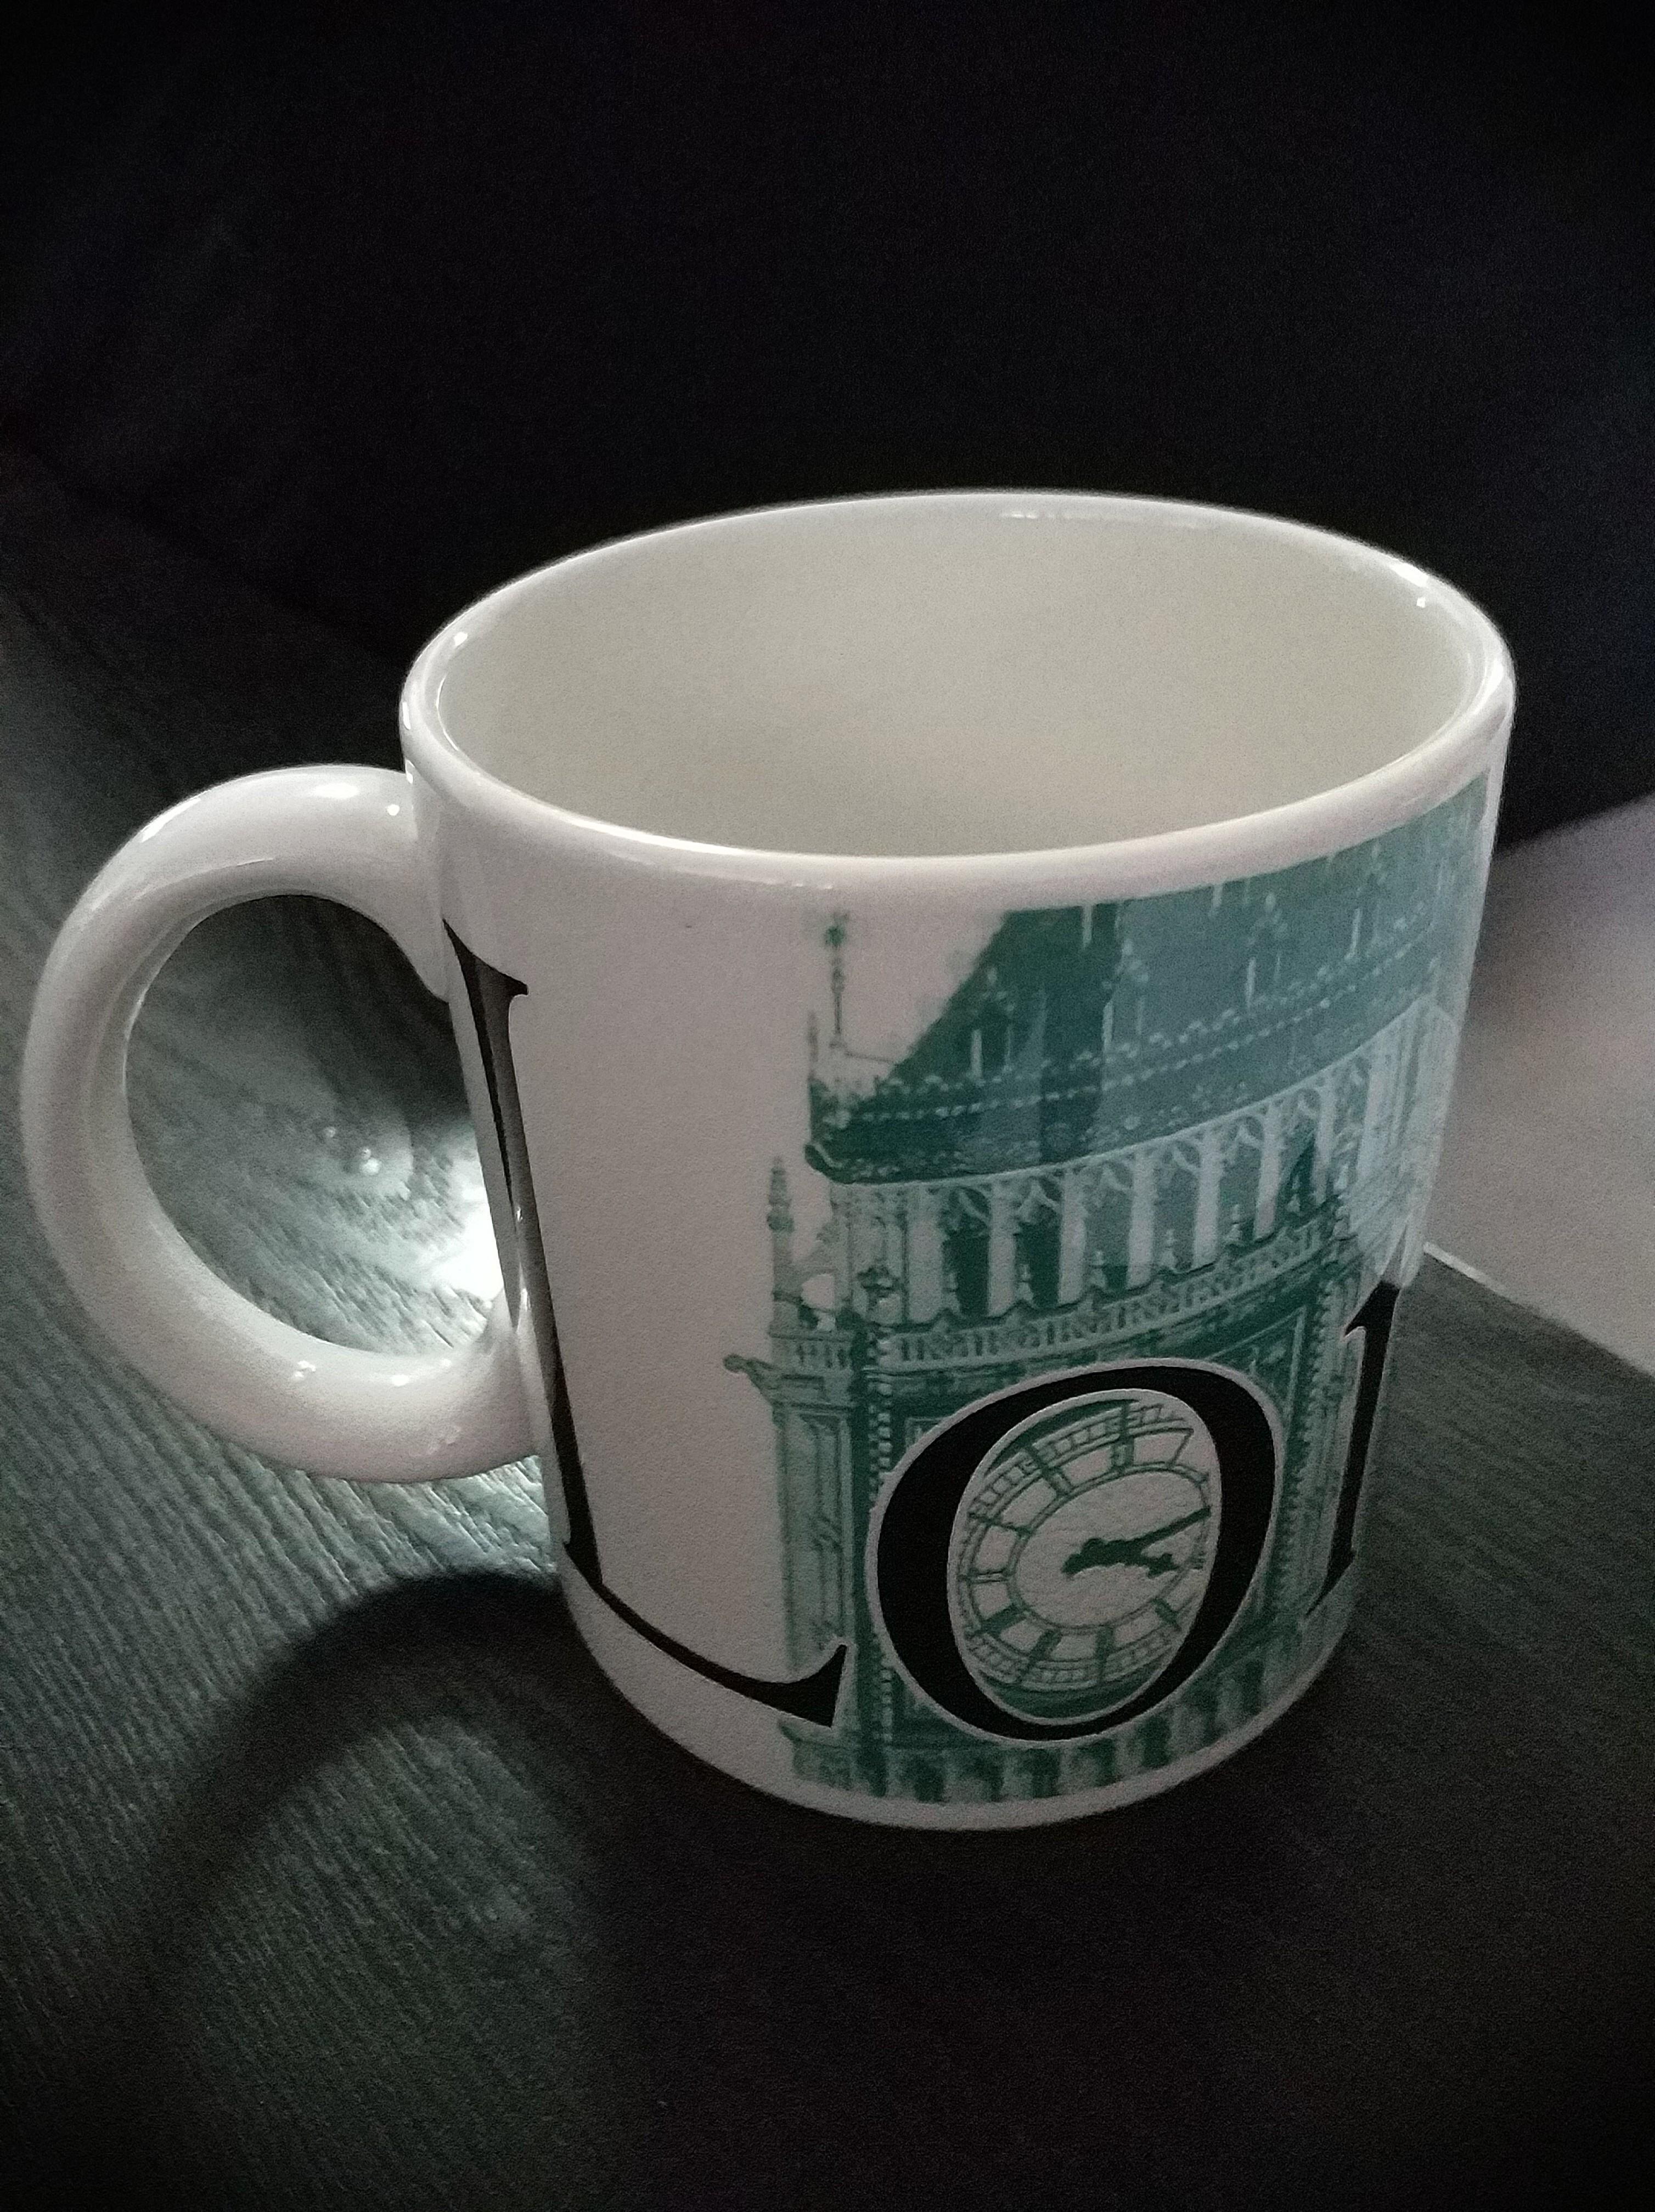 City 2002 Starbucks London MugVintageamp; Collectibles ARjL435q